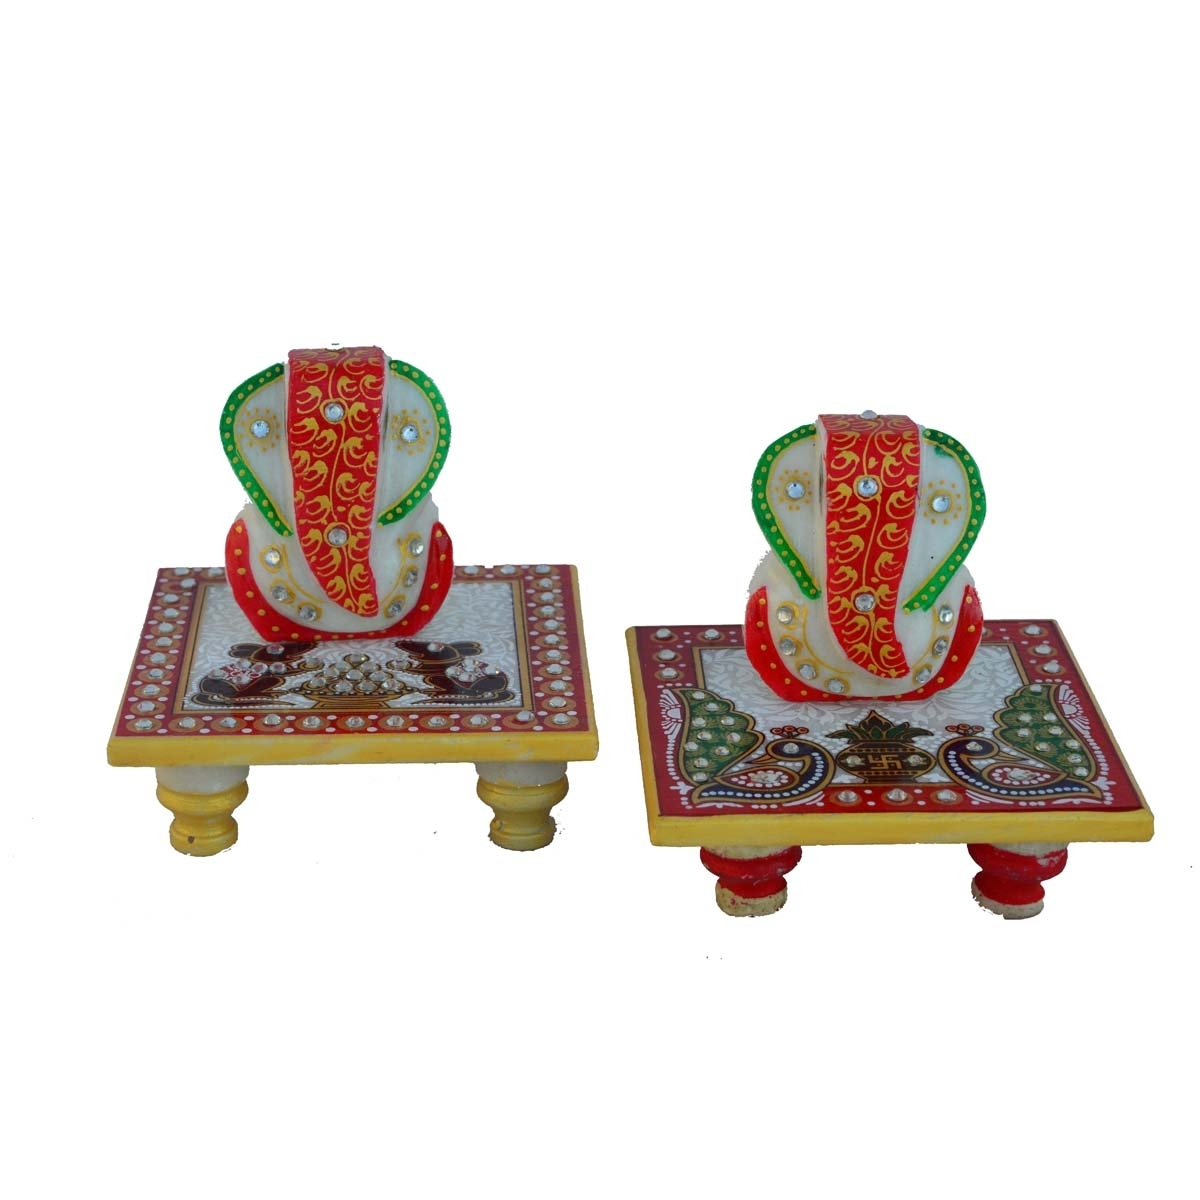 Combo of 2 Ganesha Chowkis Indian Home Decor